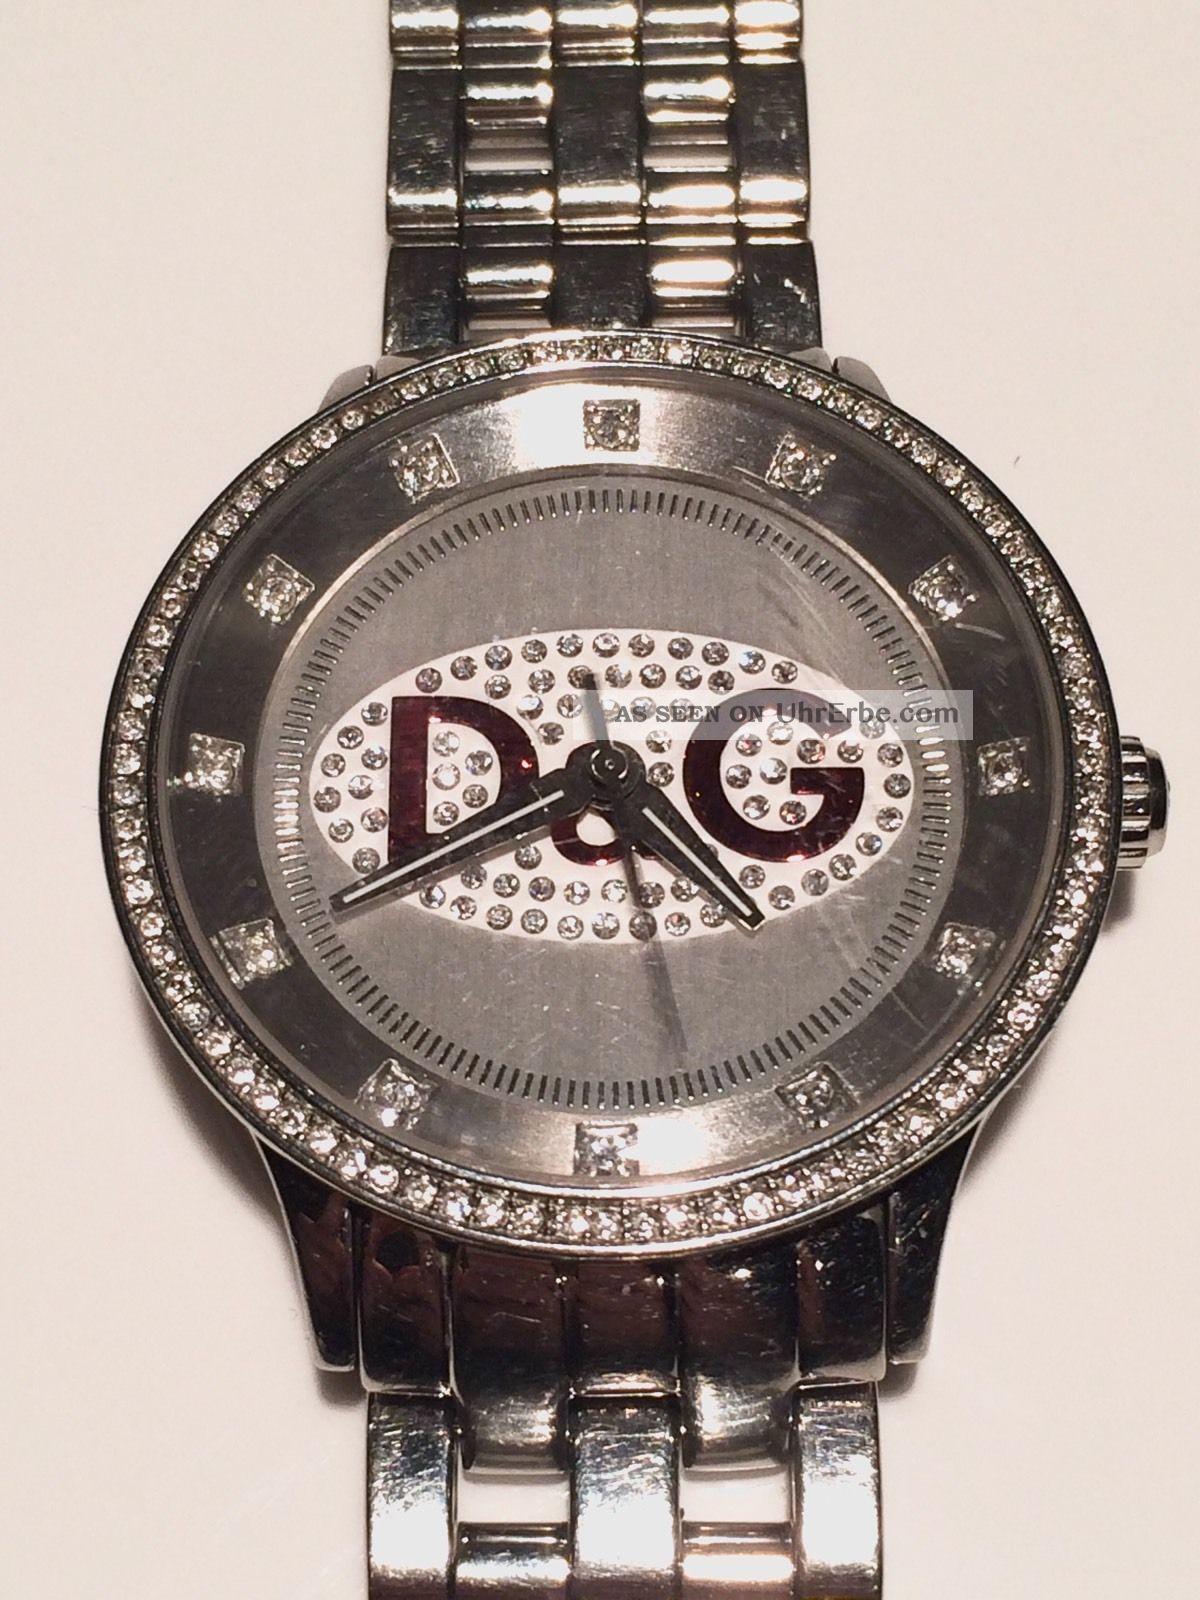 D&g Dolce Gabbana Unisex Uhr Watch Prime Time Big Silber Rot Ovp Armbanduhren Bild